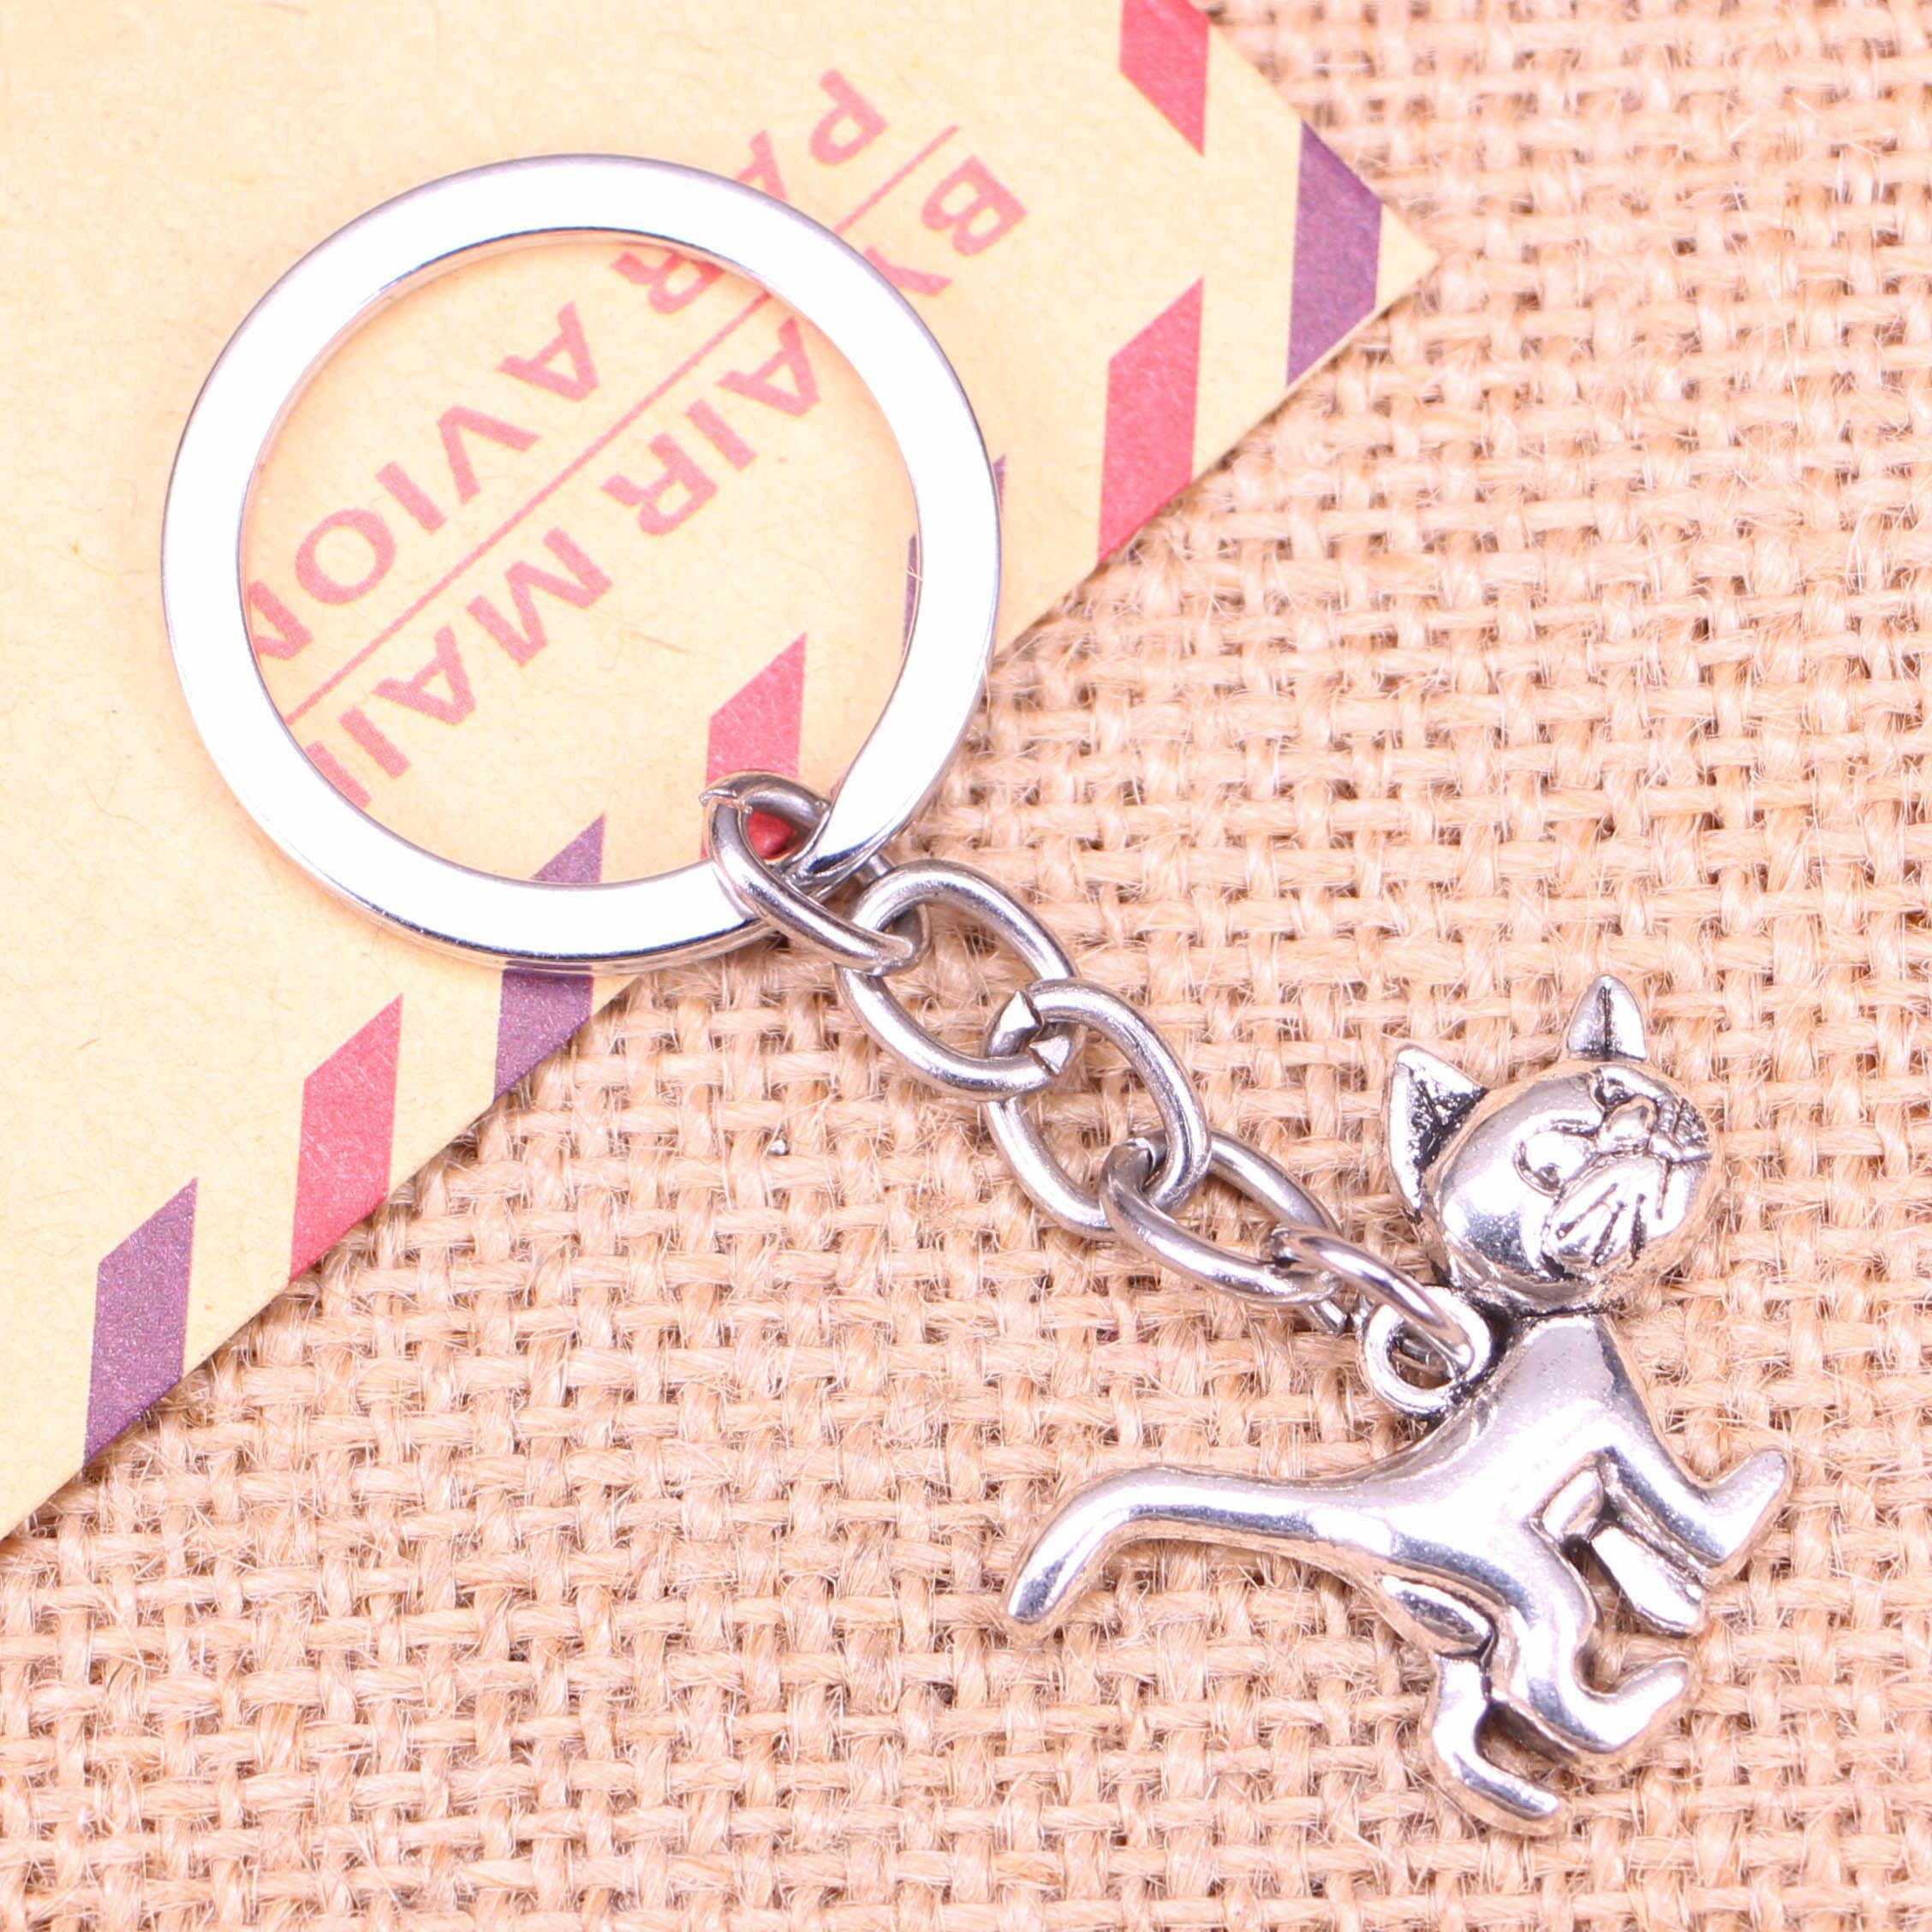 20pcs New Fashion Keychain 30x22mm cat Pendants DIY Men Jewelry Car Key Chain Ring Holder Souvenir For Gift